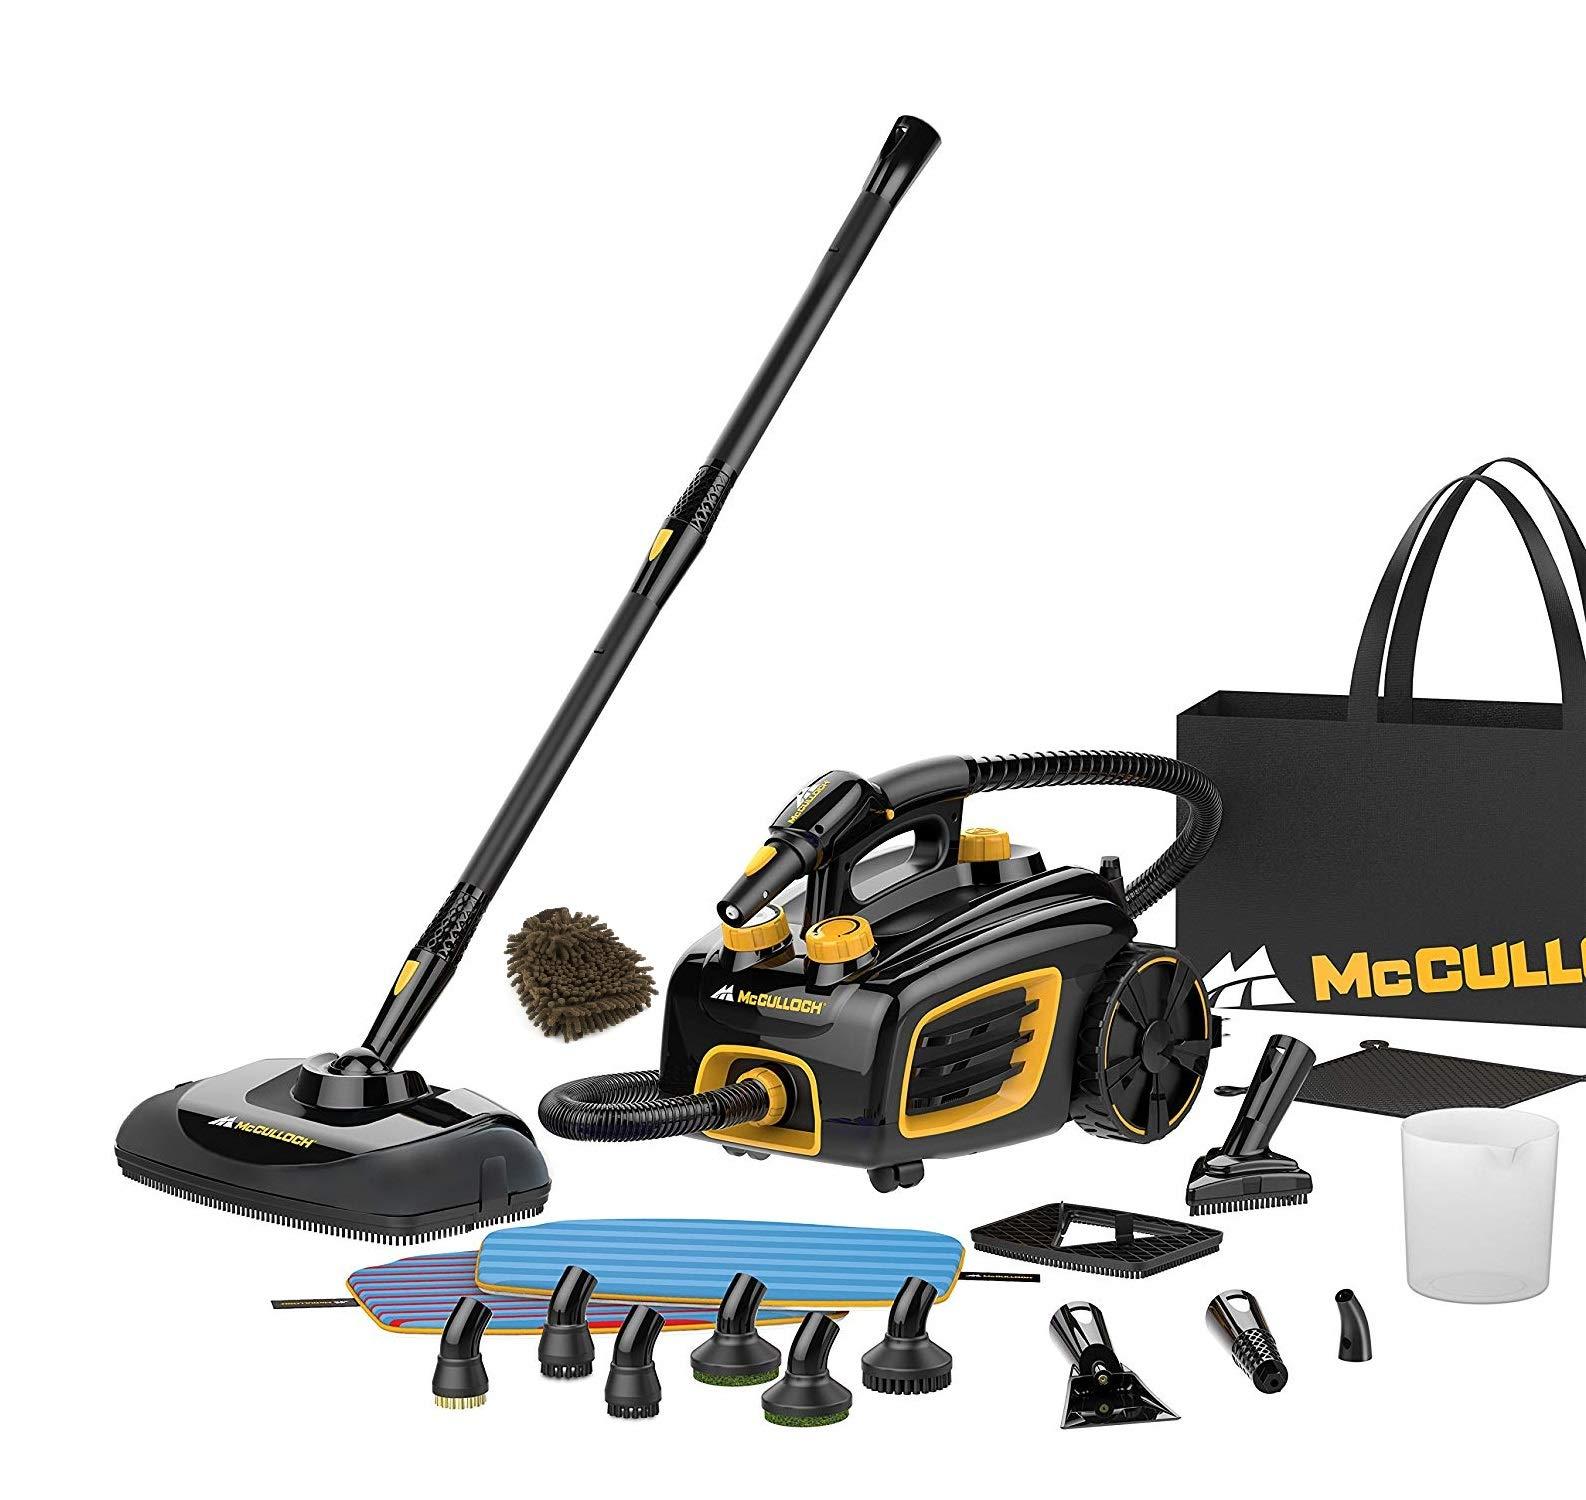 McCulloch MC1375 Canister Steam Cleaner System, Black Heavy-Duty (Complete Set) w/Bonus: Premium Microfiber Cleaner Bundle